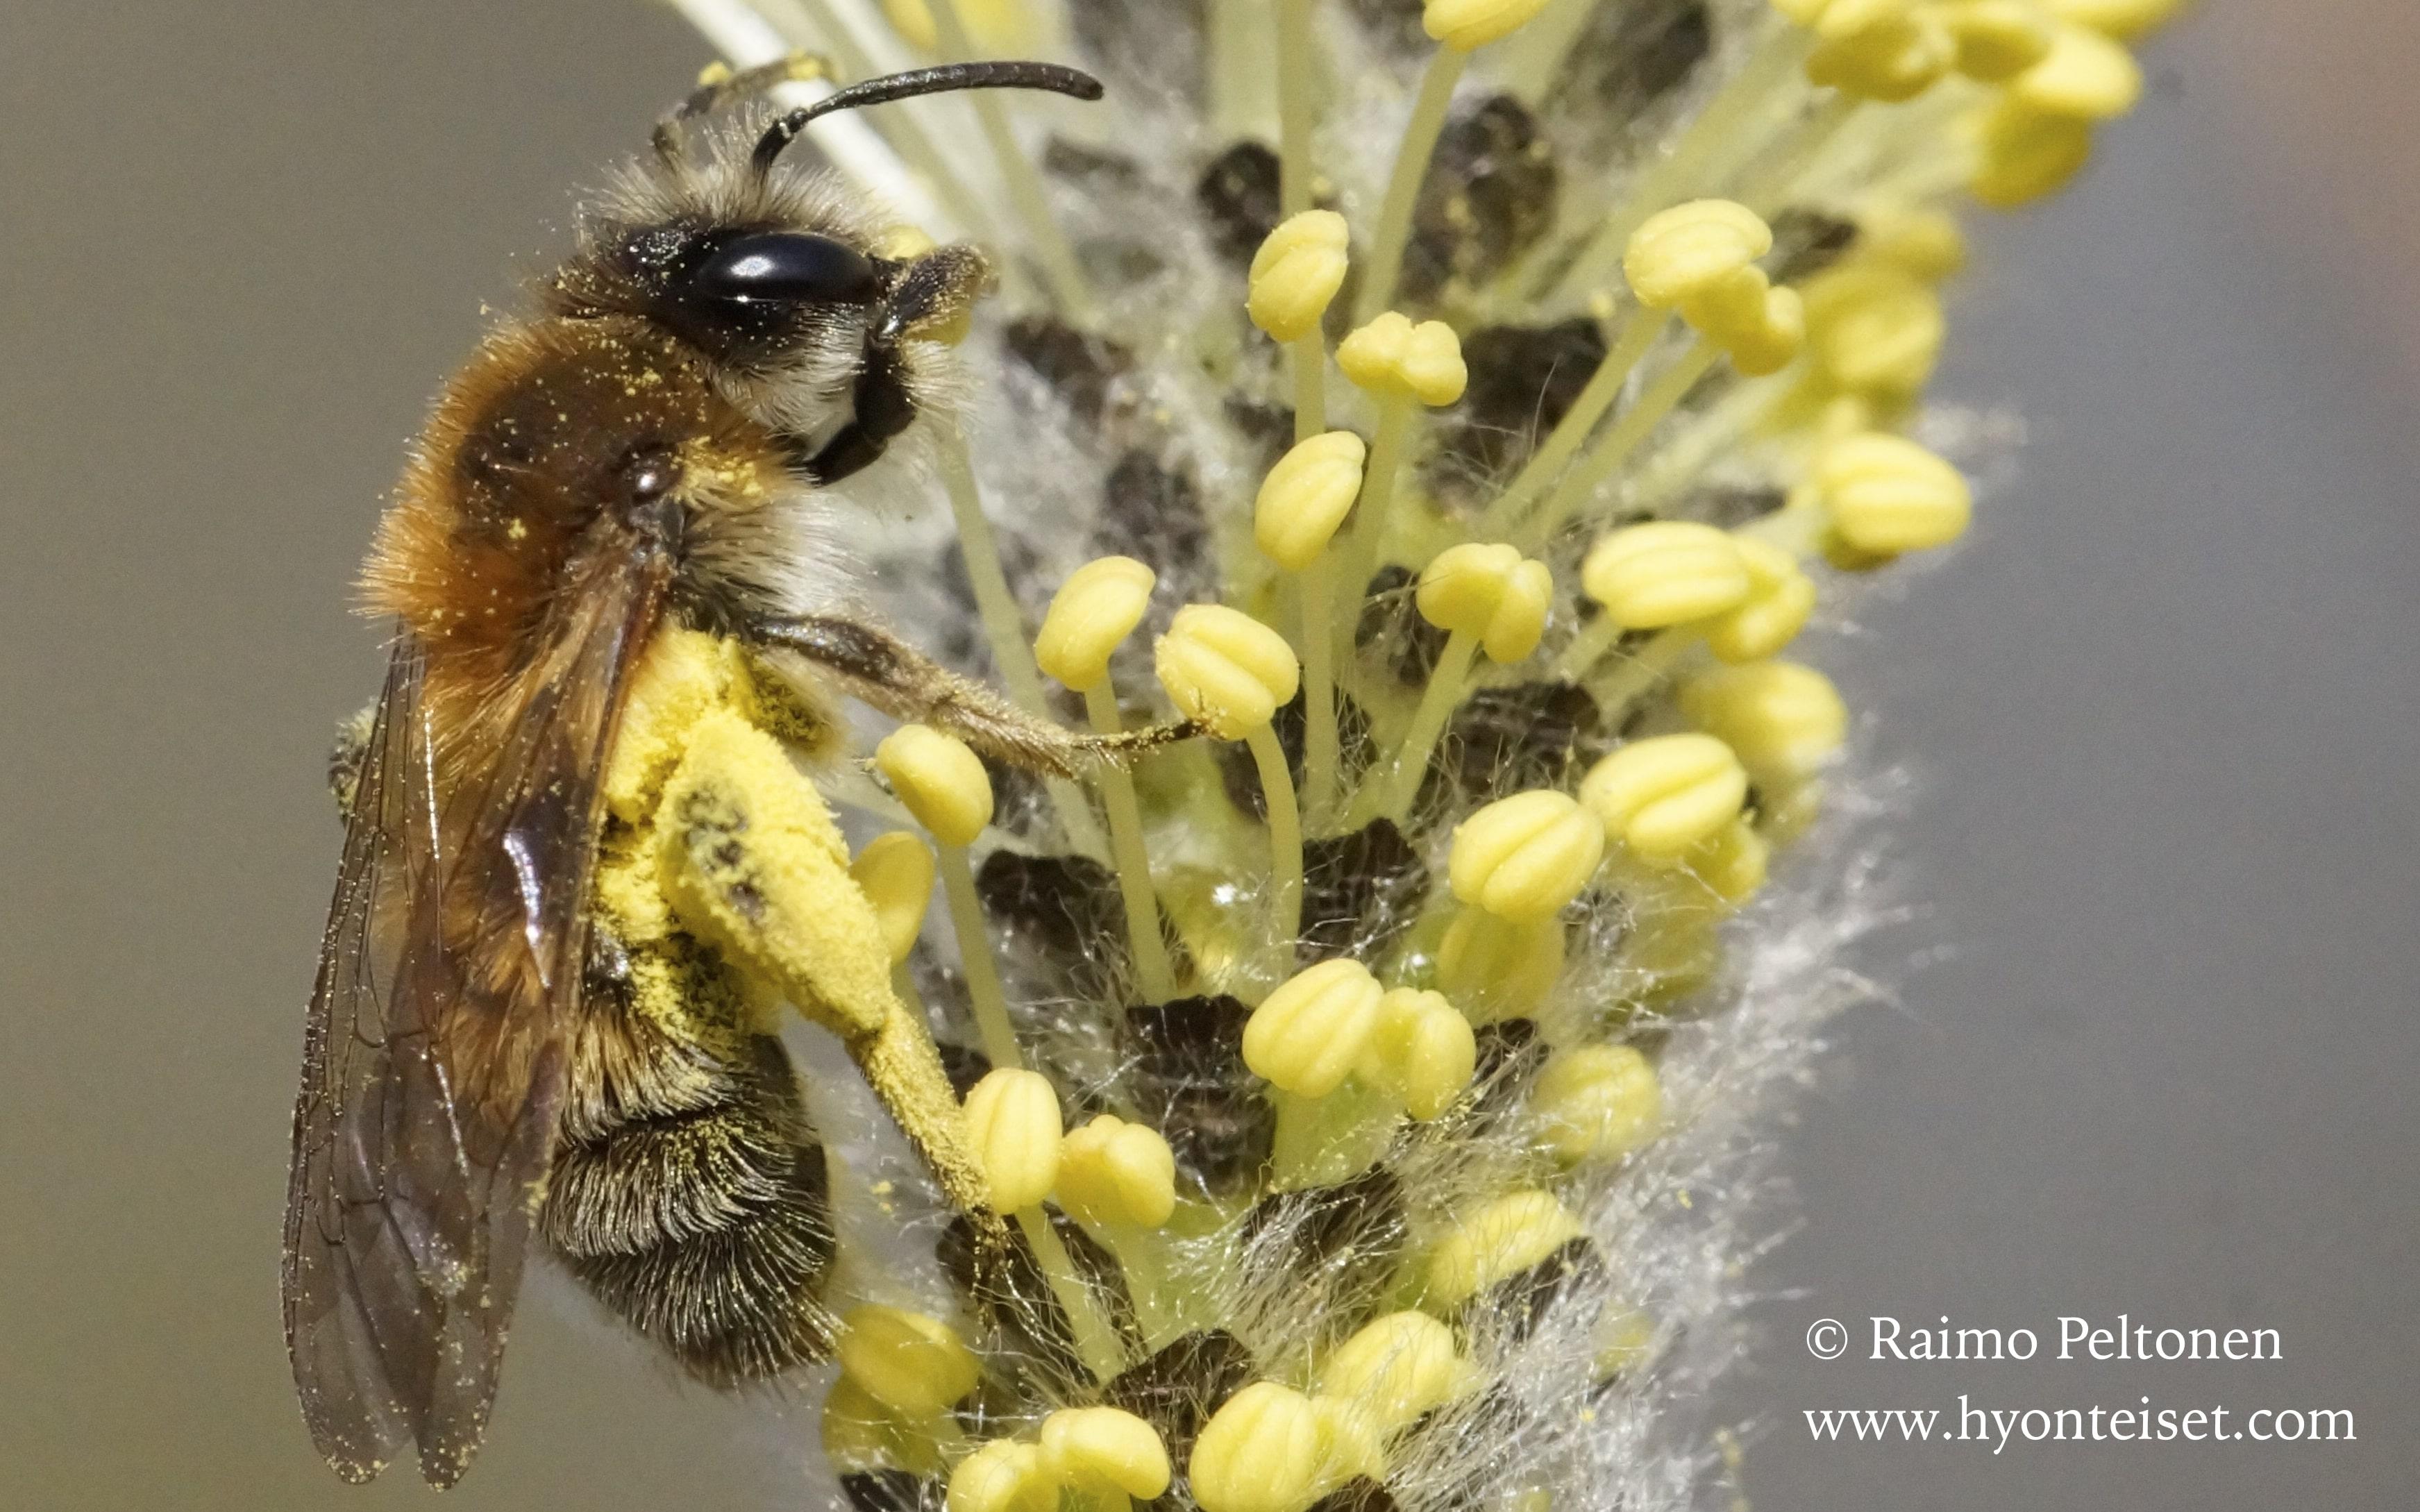 Andrena praecox-hammasmaamehiläinen, naaras (det. Juho Paukkunen)